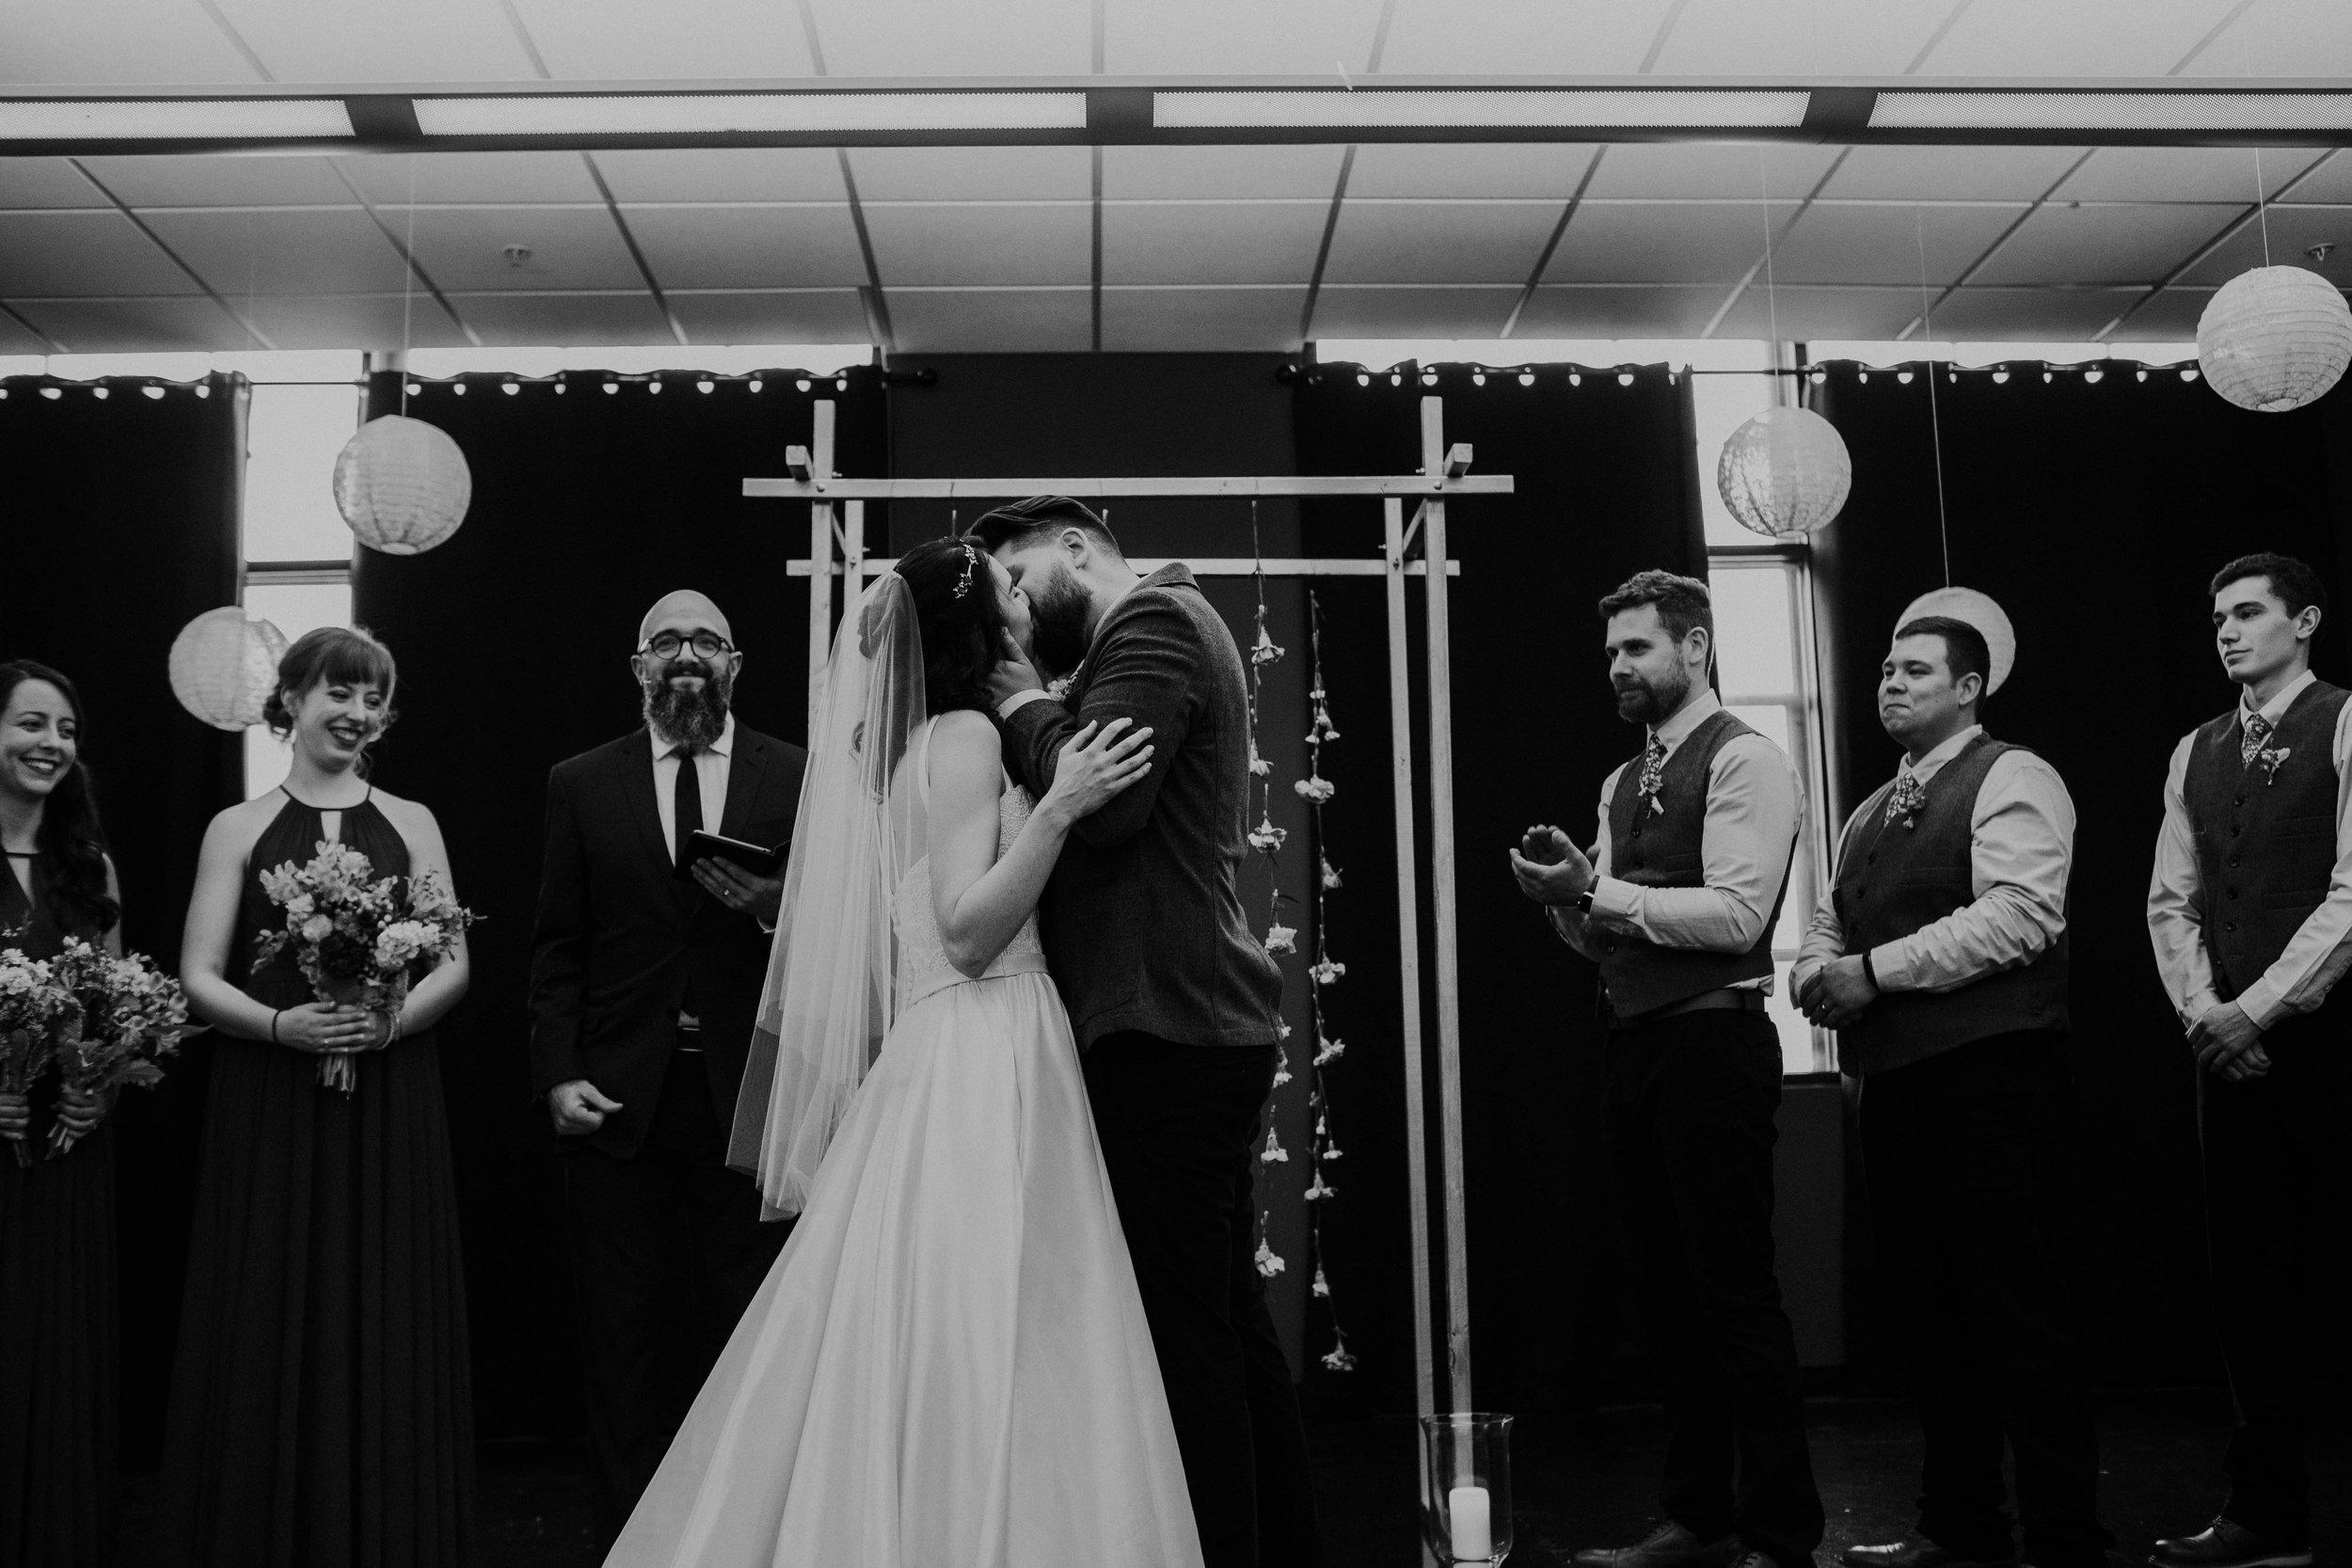 Columbus, Ohio Wedding Photographer Everal Barn At Heritage Park Wedding Venue Grace E Jones Photography53.jpg